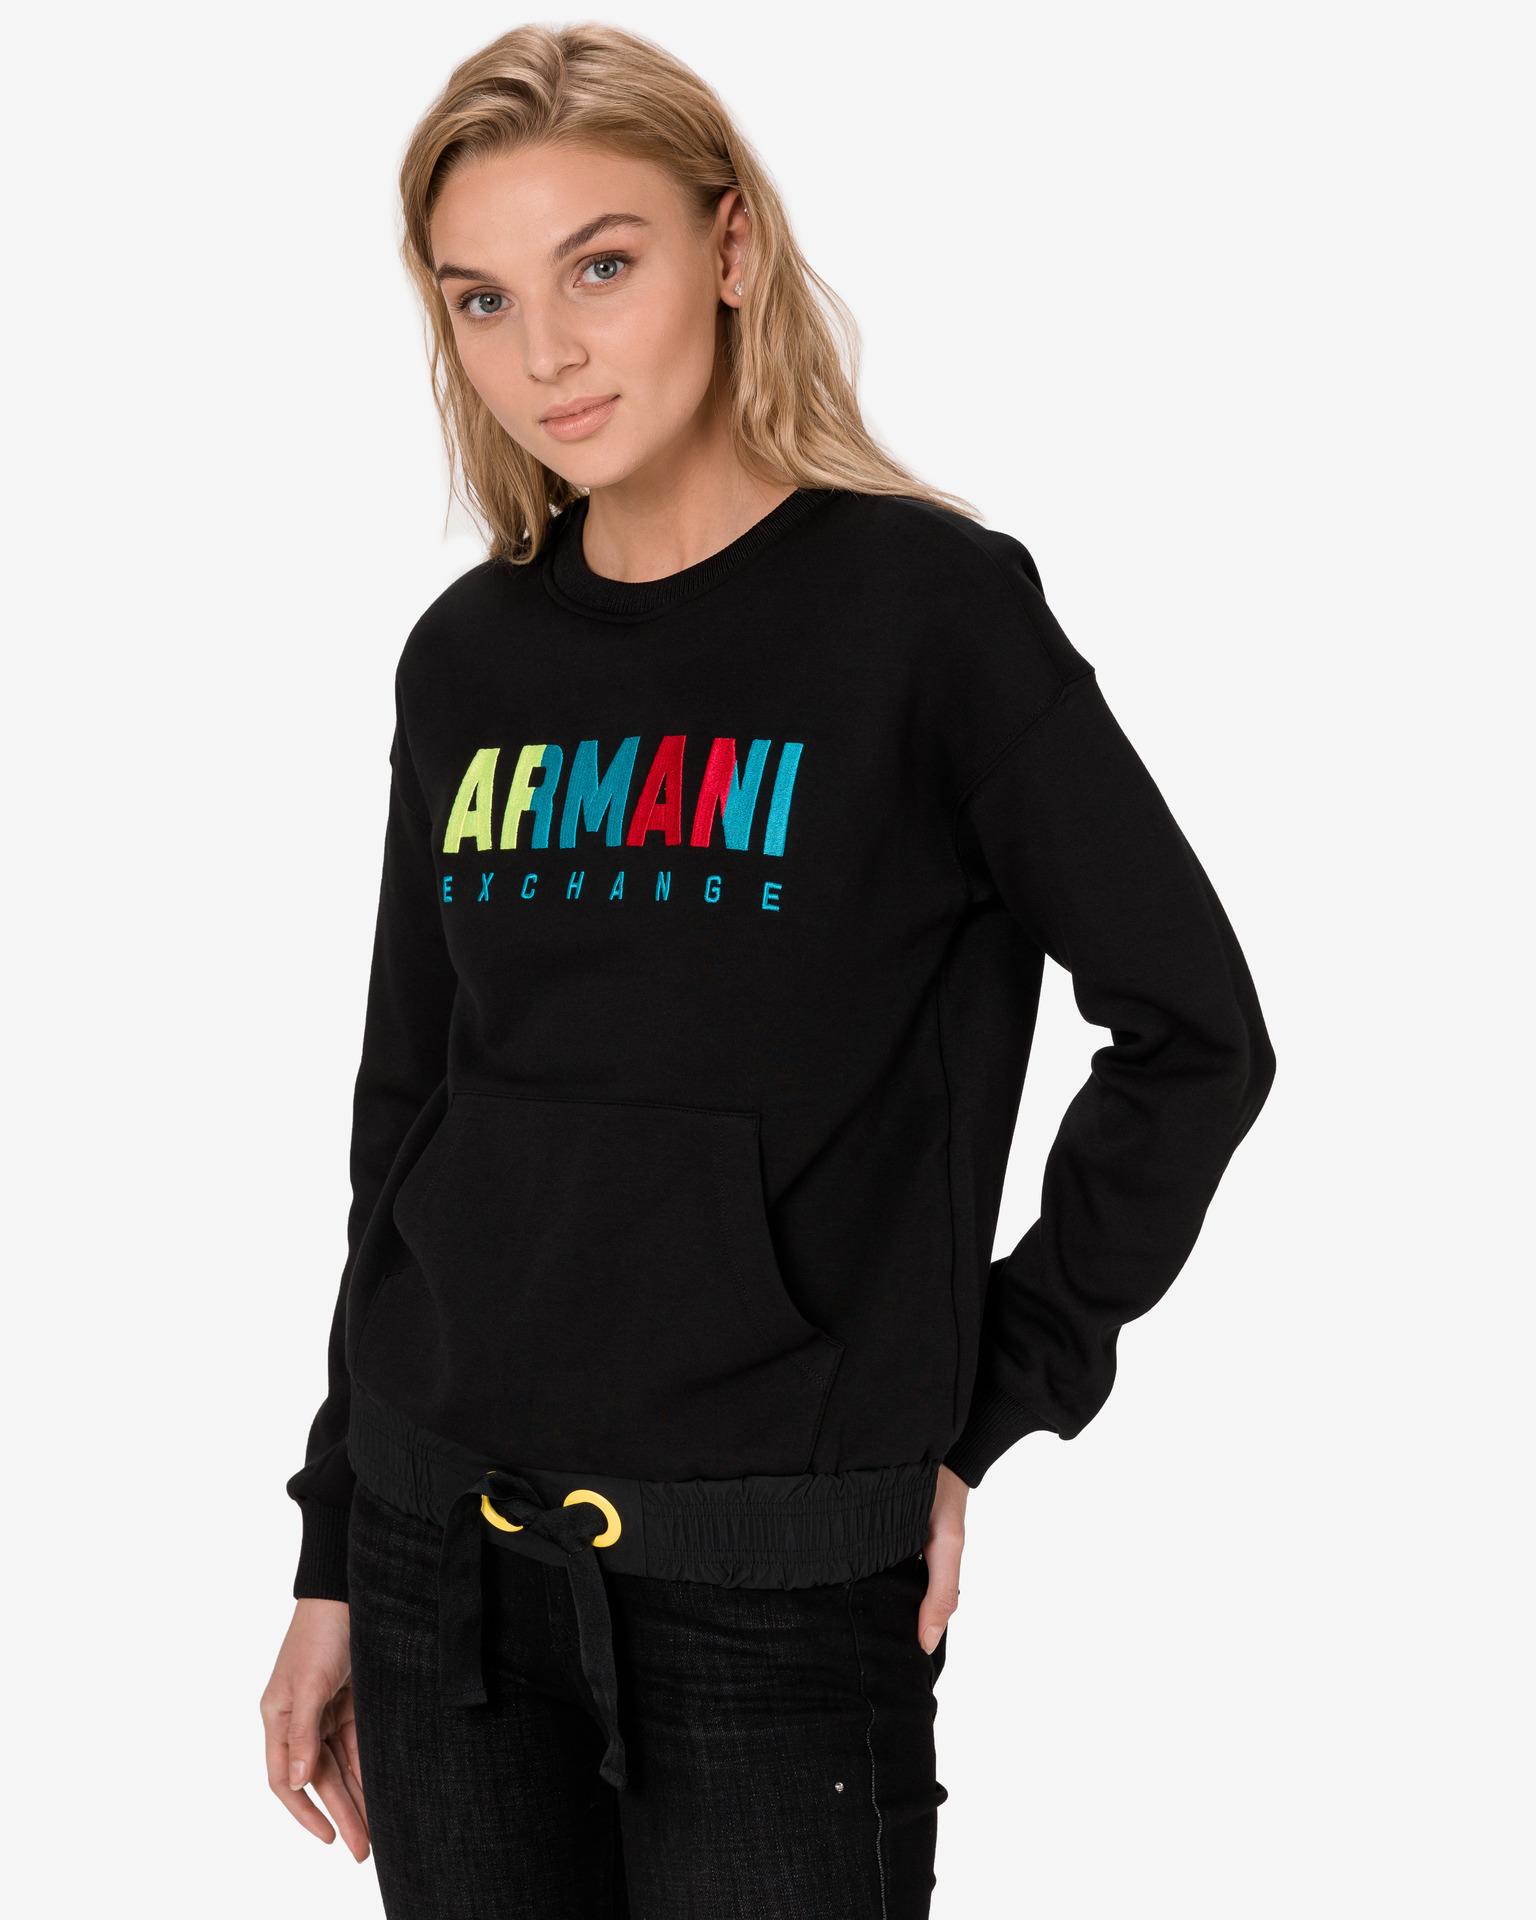 Mikiny pre ženy Armani Exchange - čierna - XS